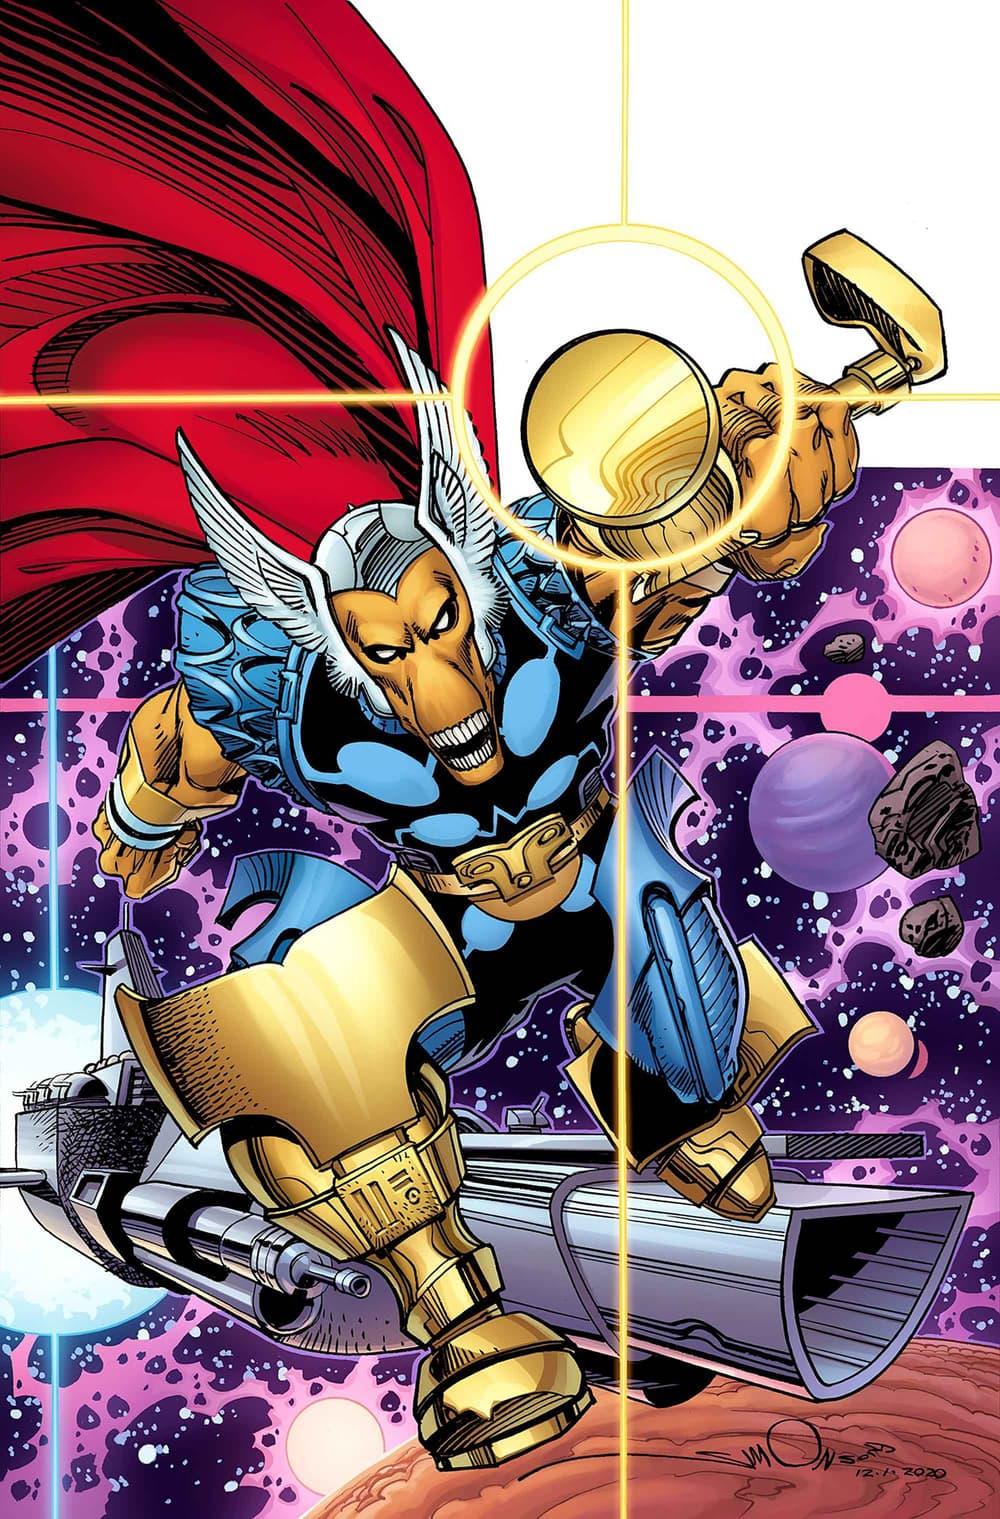 Beta Ray Bill variant cover by Walt Simonson